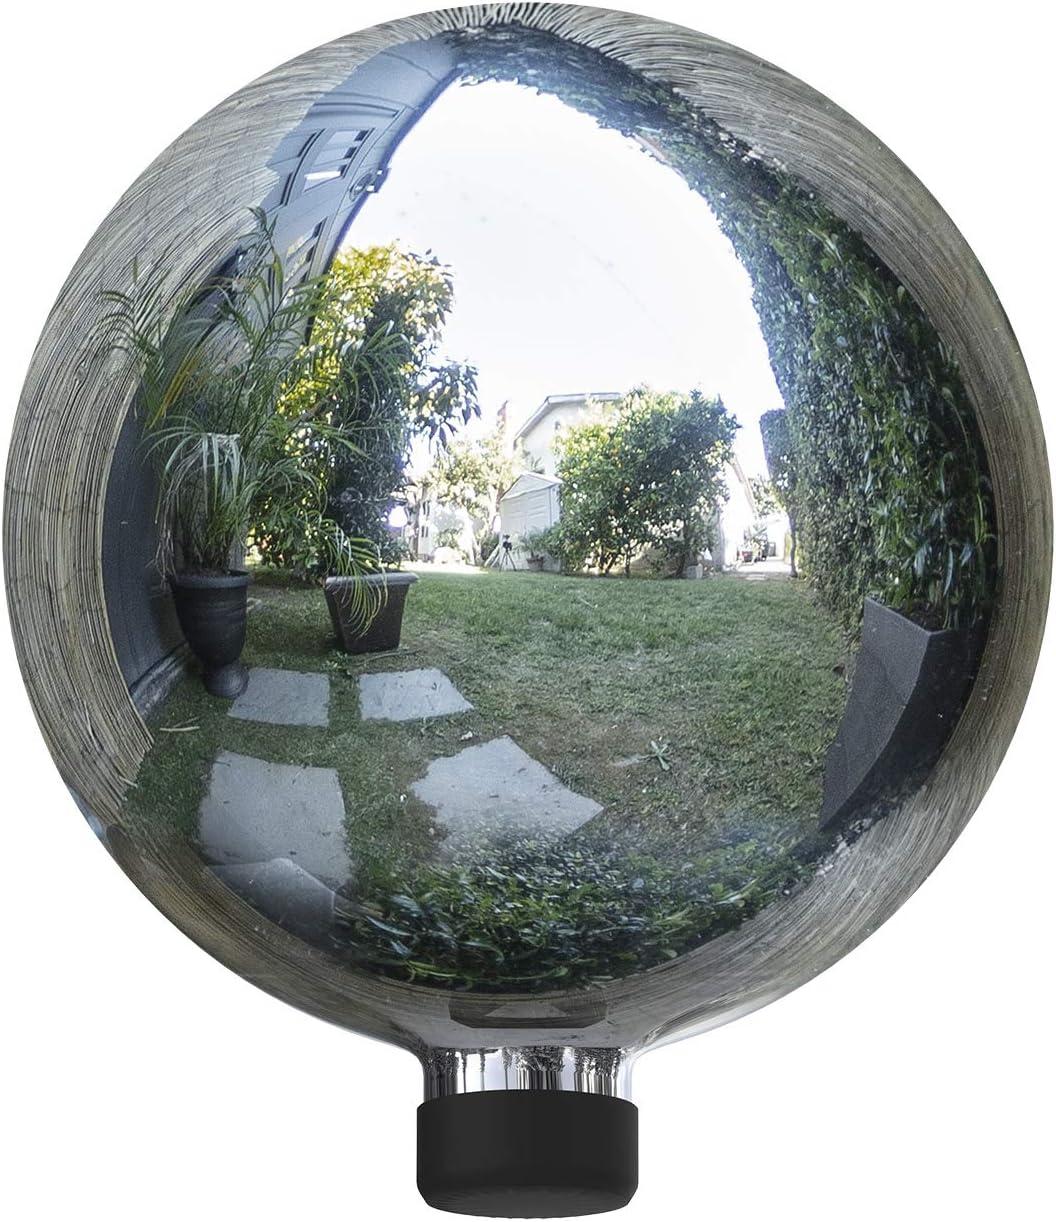 Alpine Corporation GLB292SL Garden, Lawn, Yard, Silver Alpine Glass Gazing Globe, Outdoor Festive Holiday Décor f